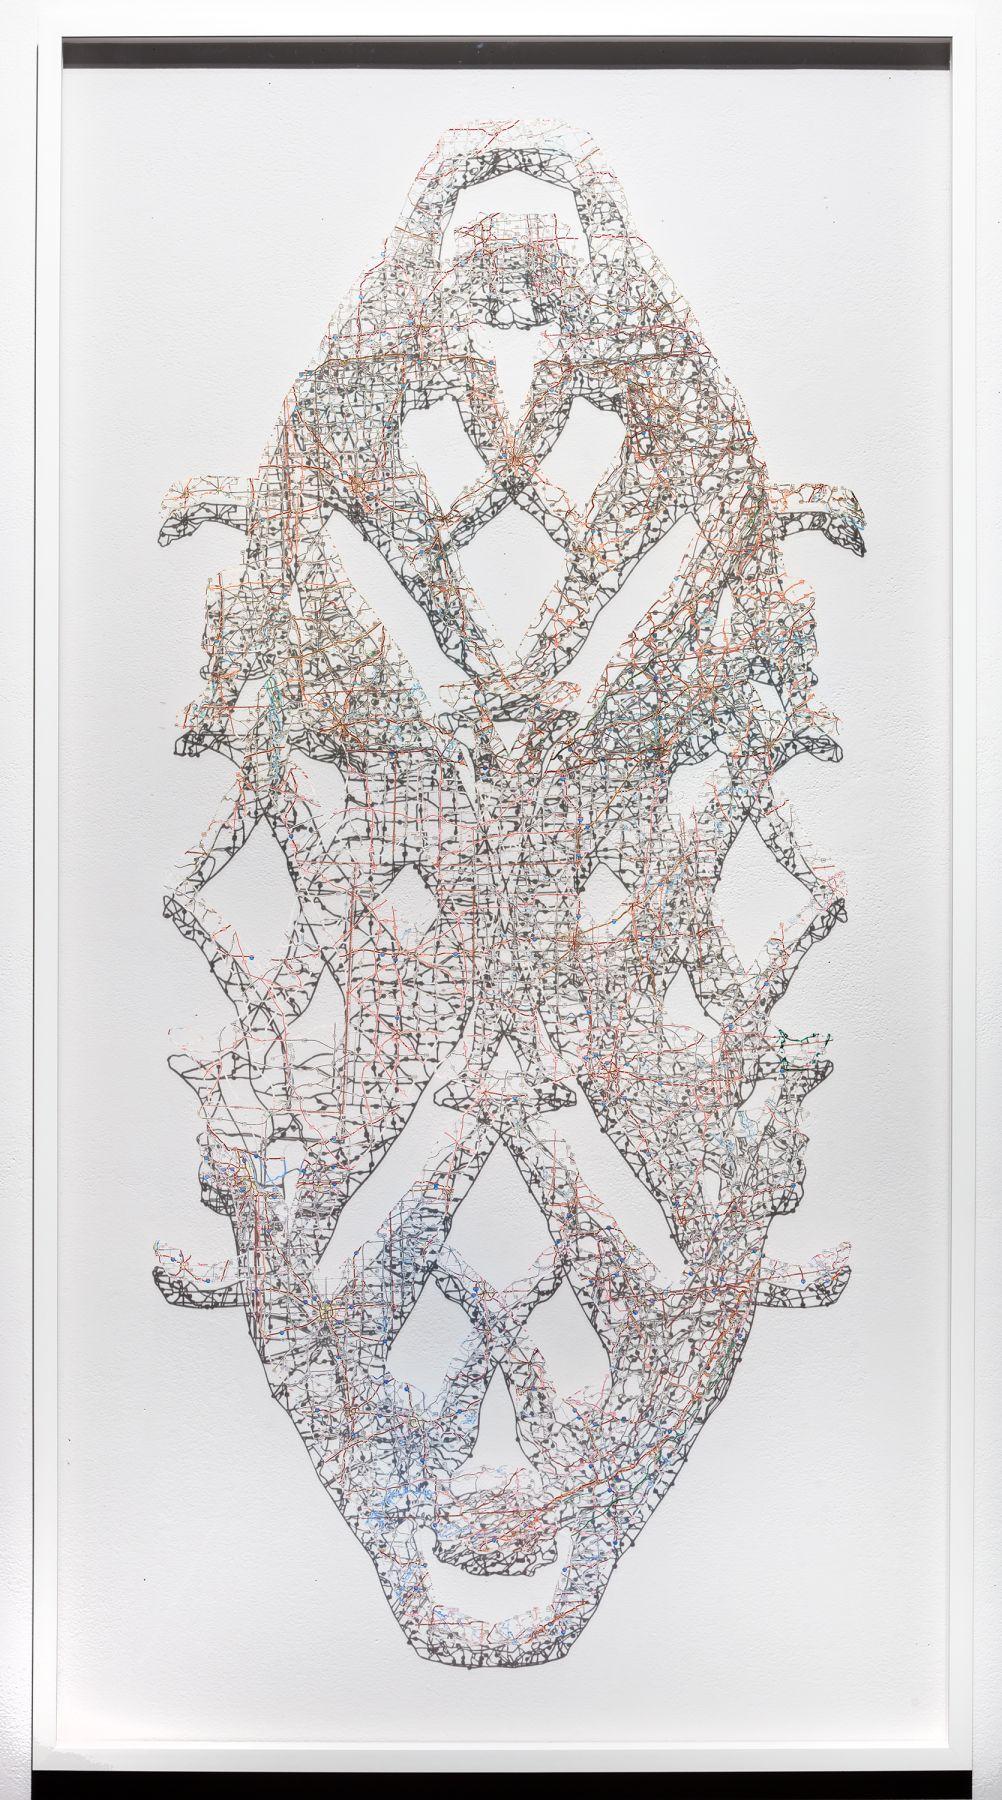 NIKKI ROSATO Untitled (Object) V, 2017